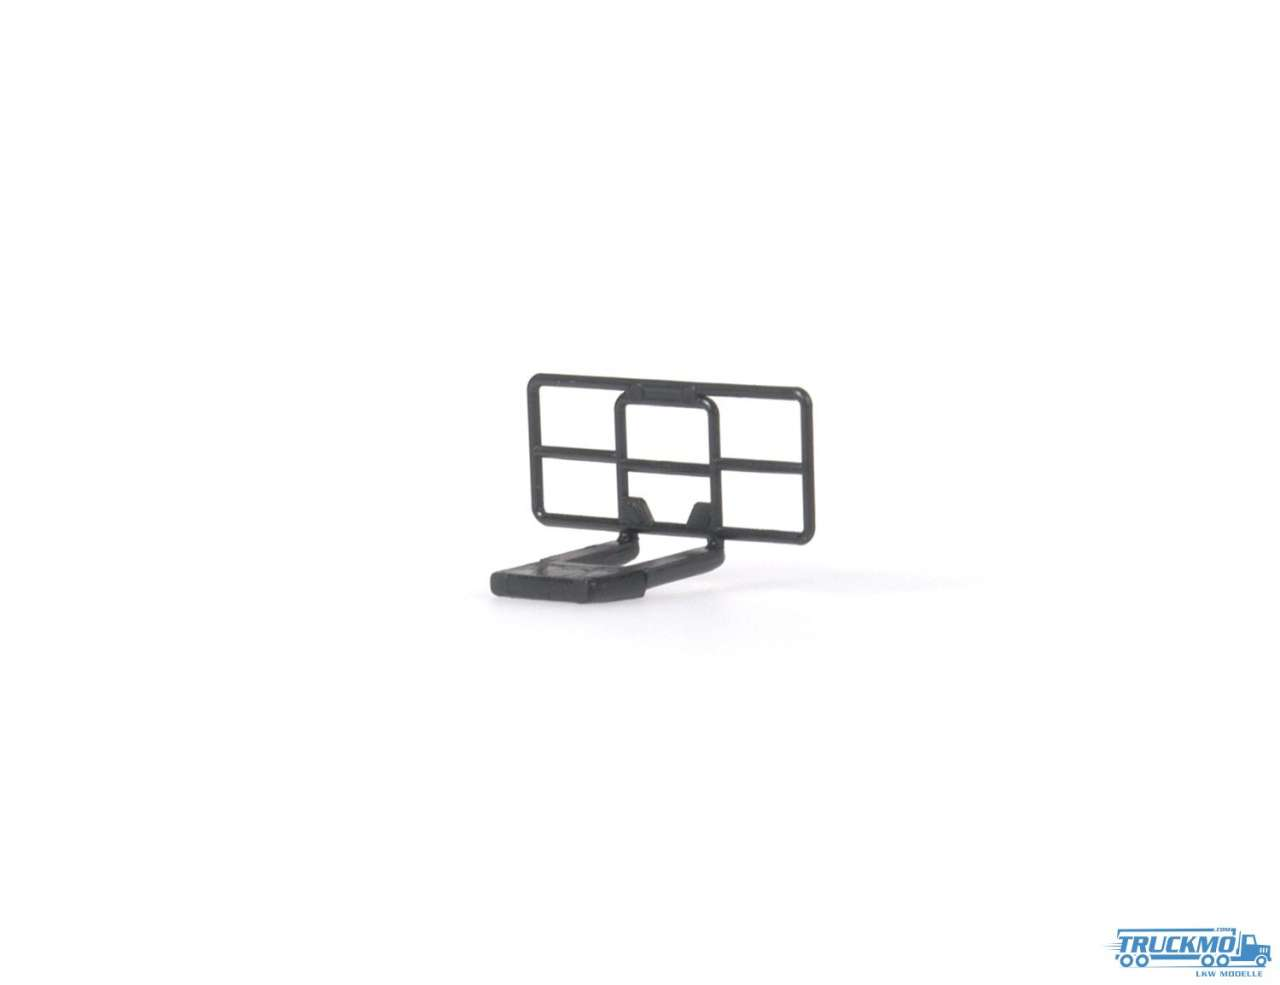 Rietze Rammschutz schwarz 5 Stück 70020